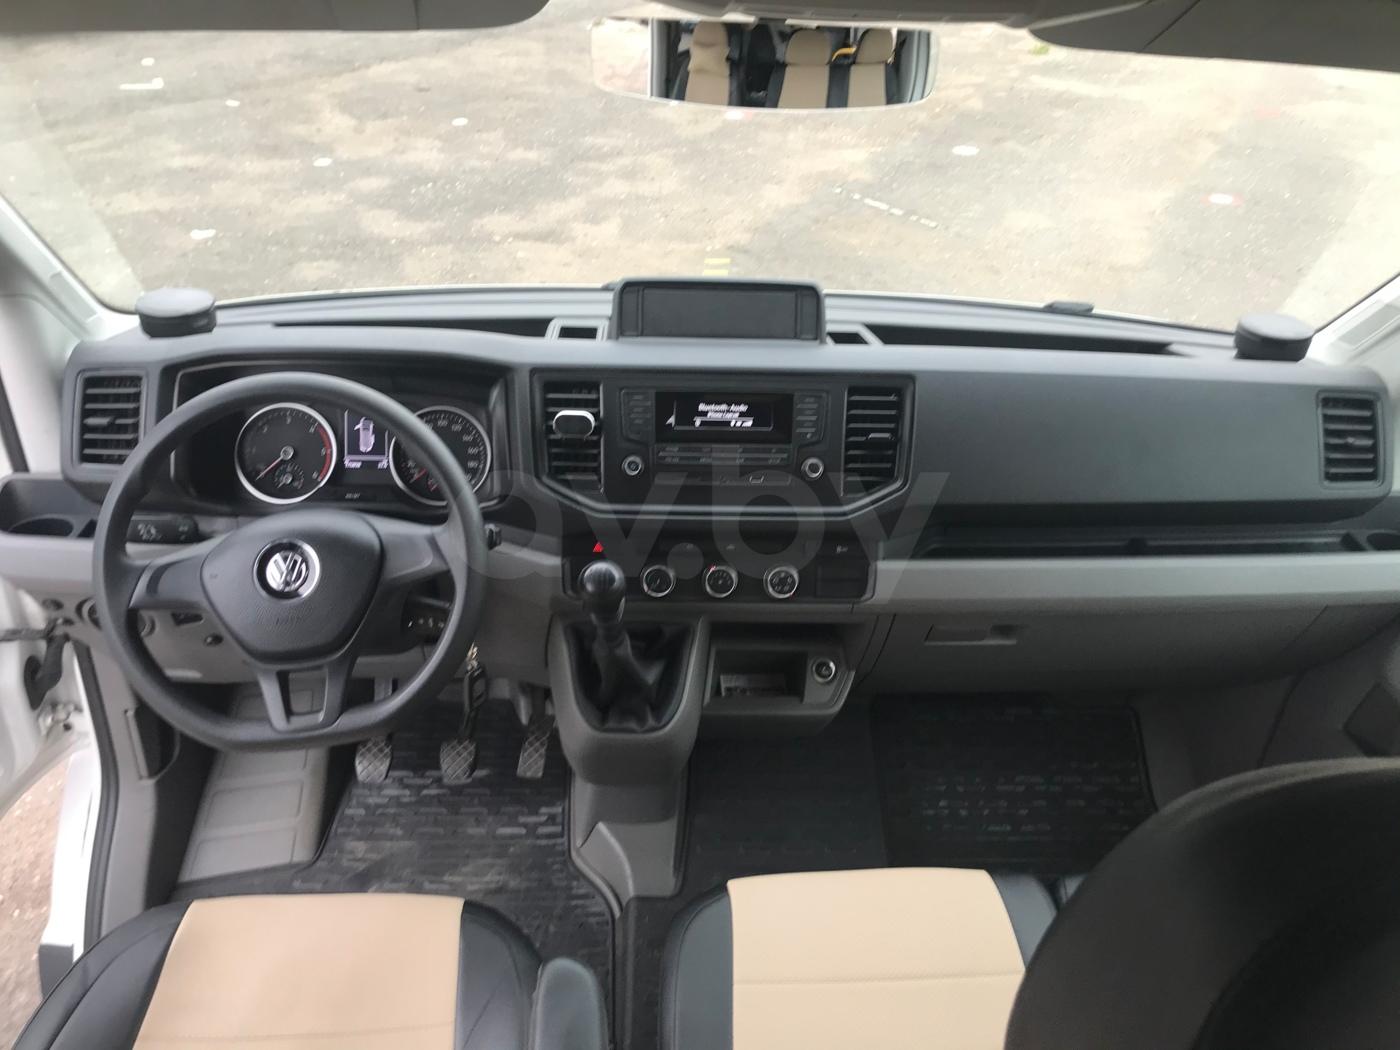 Volkswagen Crafter, 2019 г.